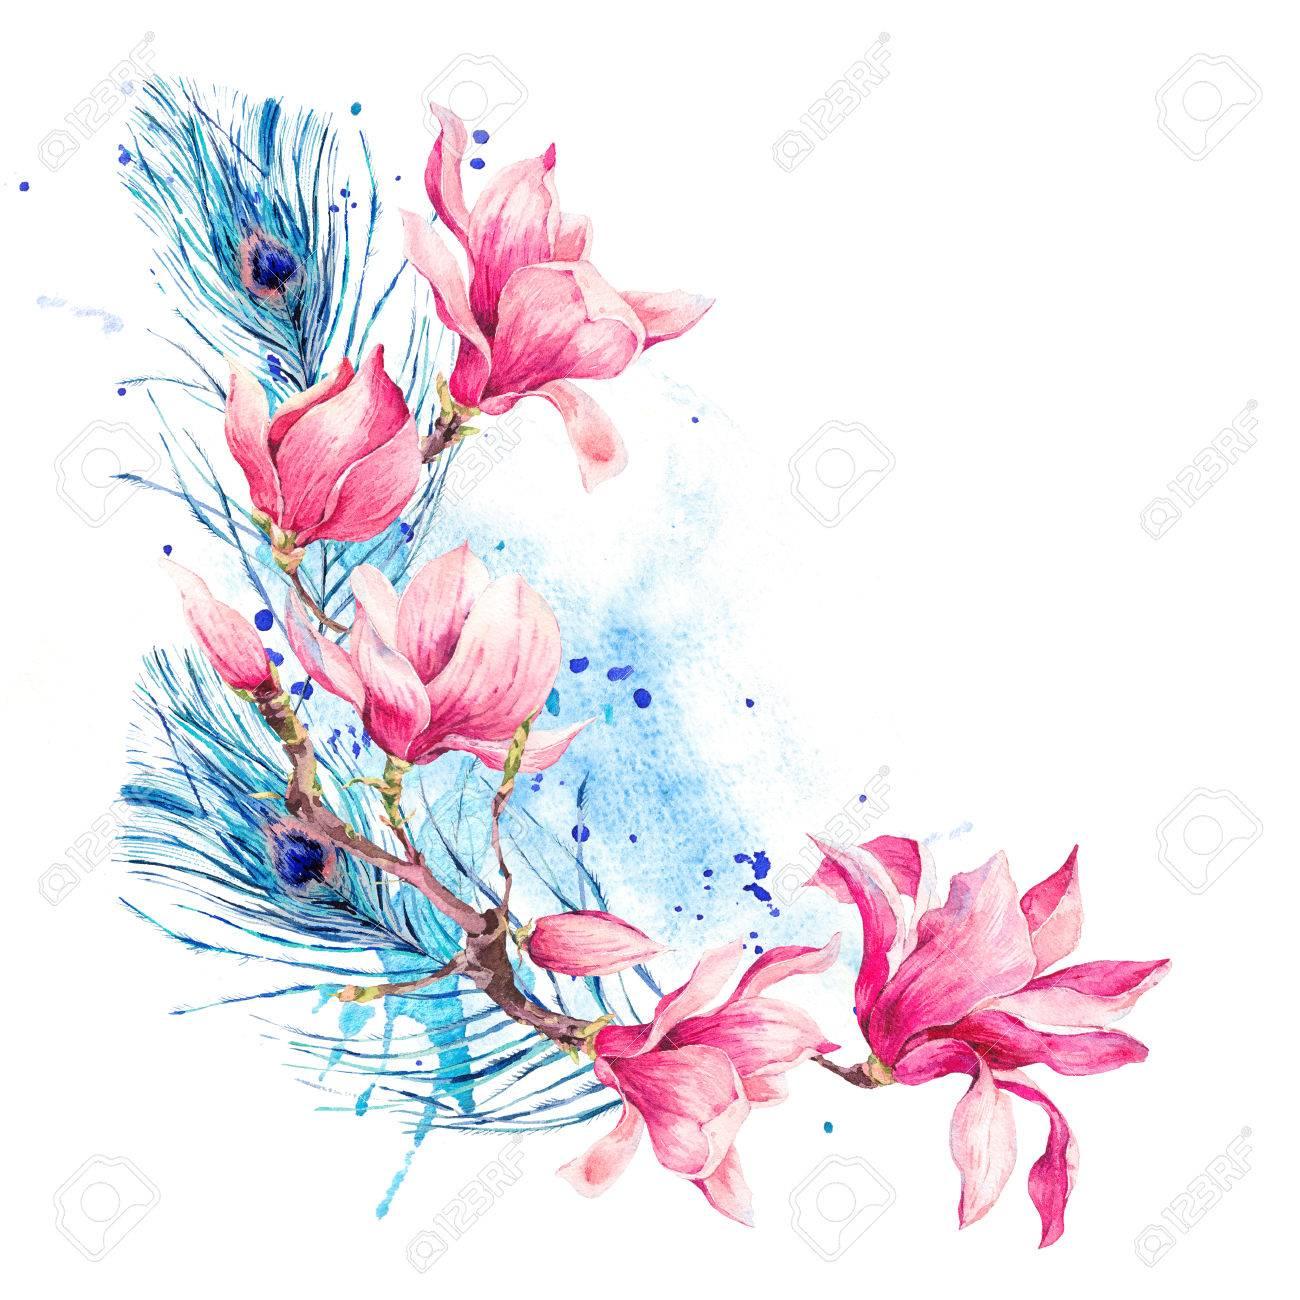 Tarjeta De Felicitacion De La Primavera Floral De La Acuarela